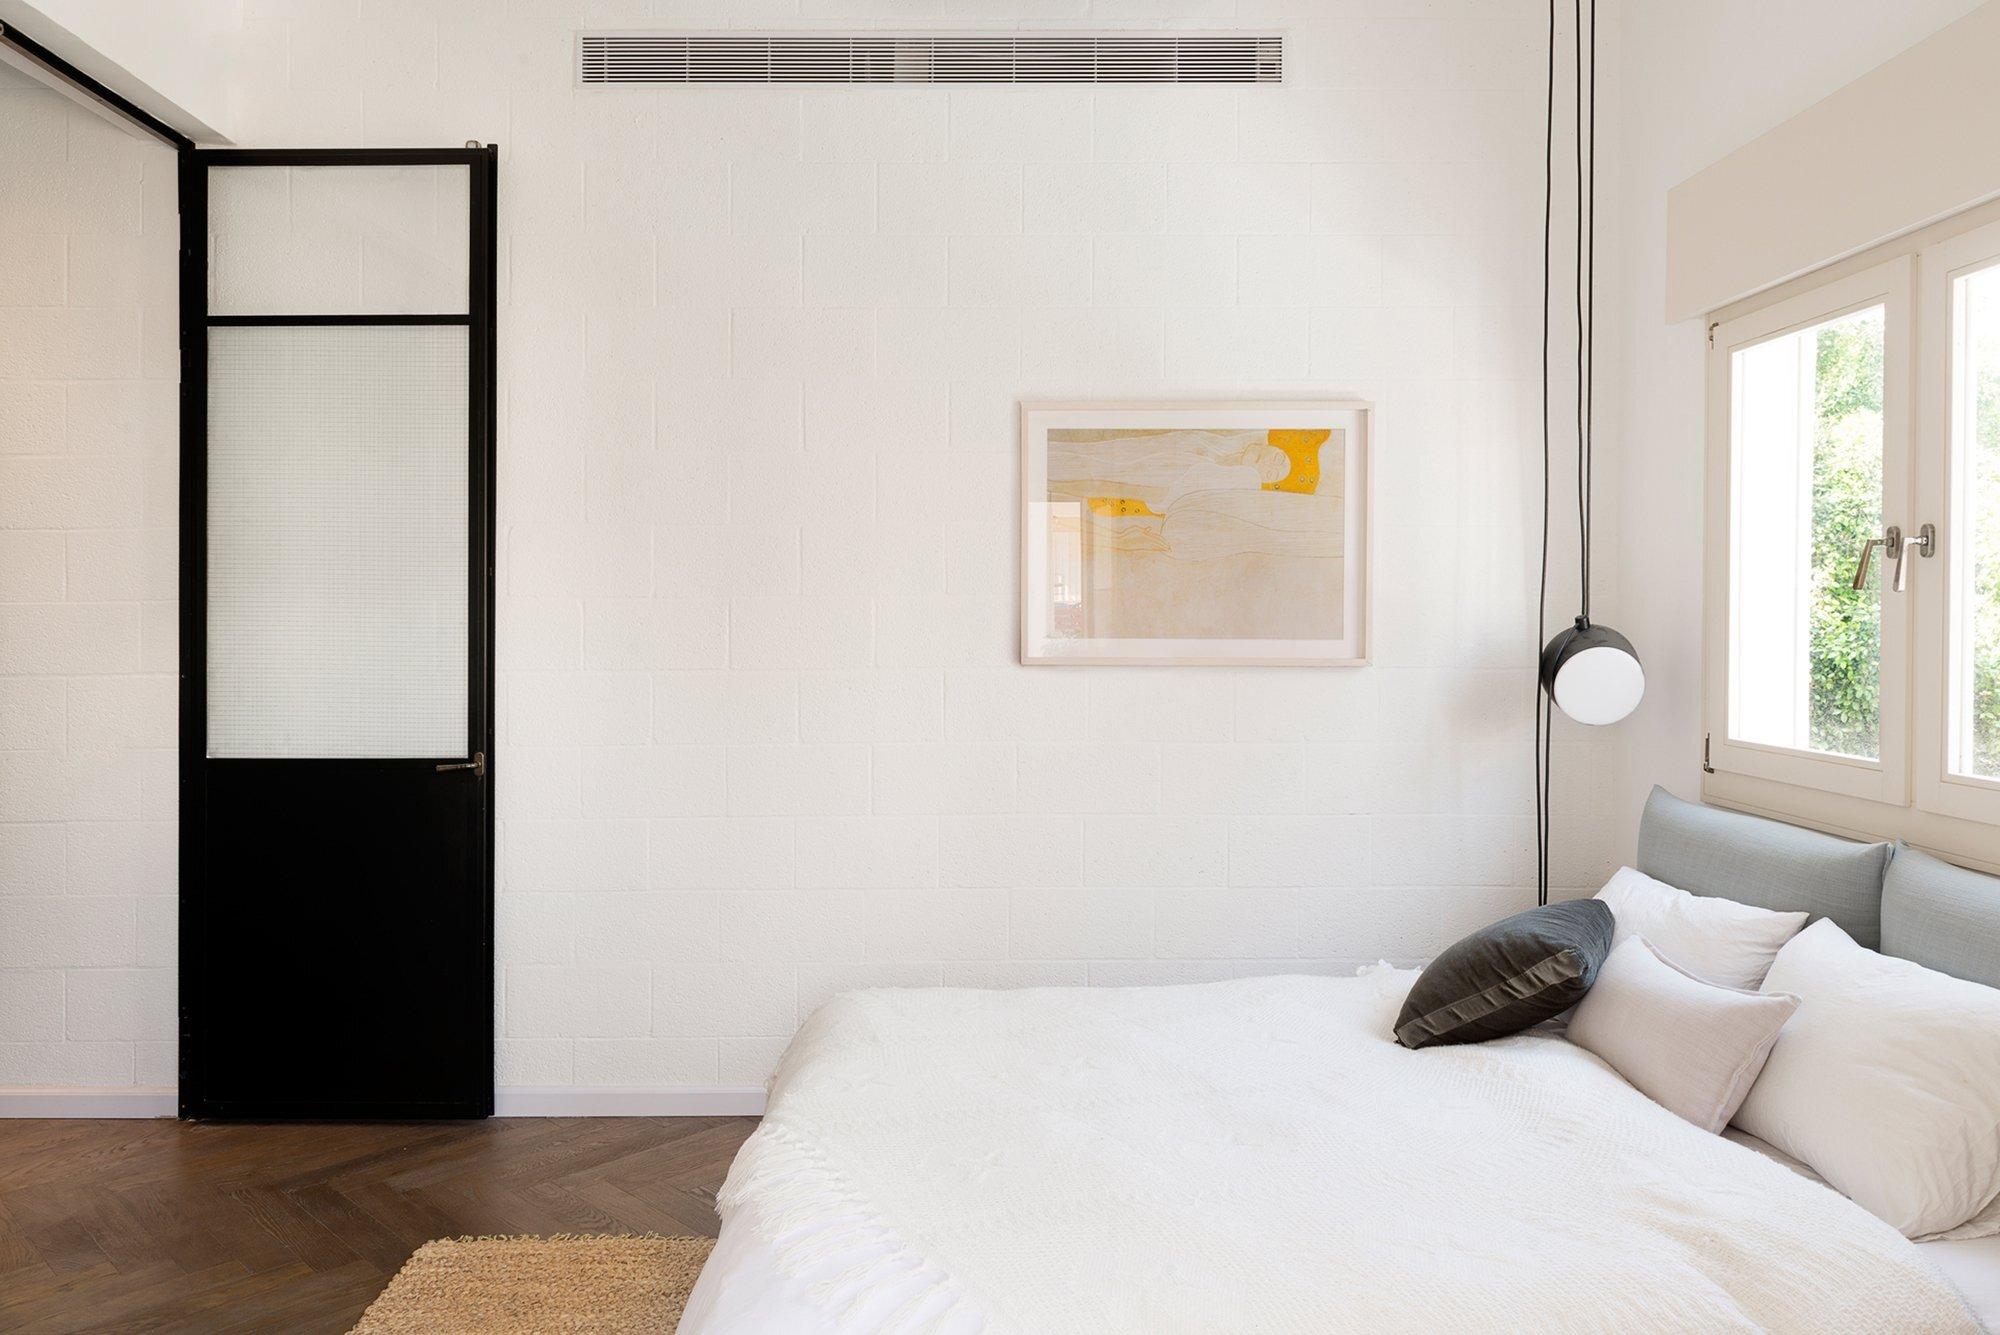 Bauhaus Apartment Redesign - Small Apartment - Studio Raanan Stern Architect - Tel Aviv - Bedroom - Humble Homes